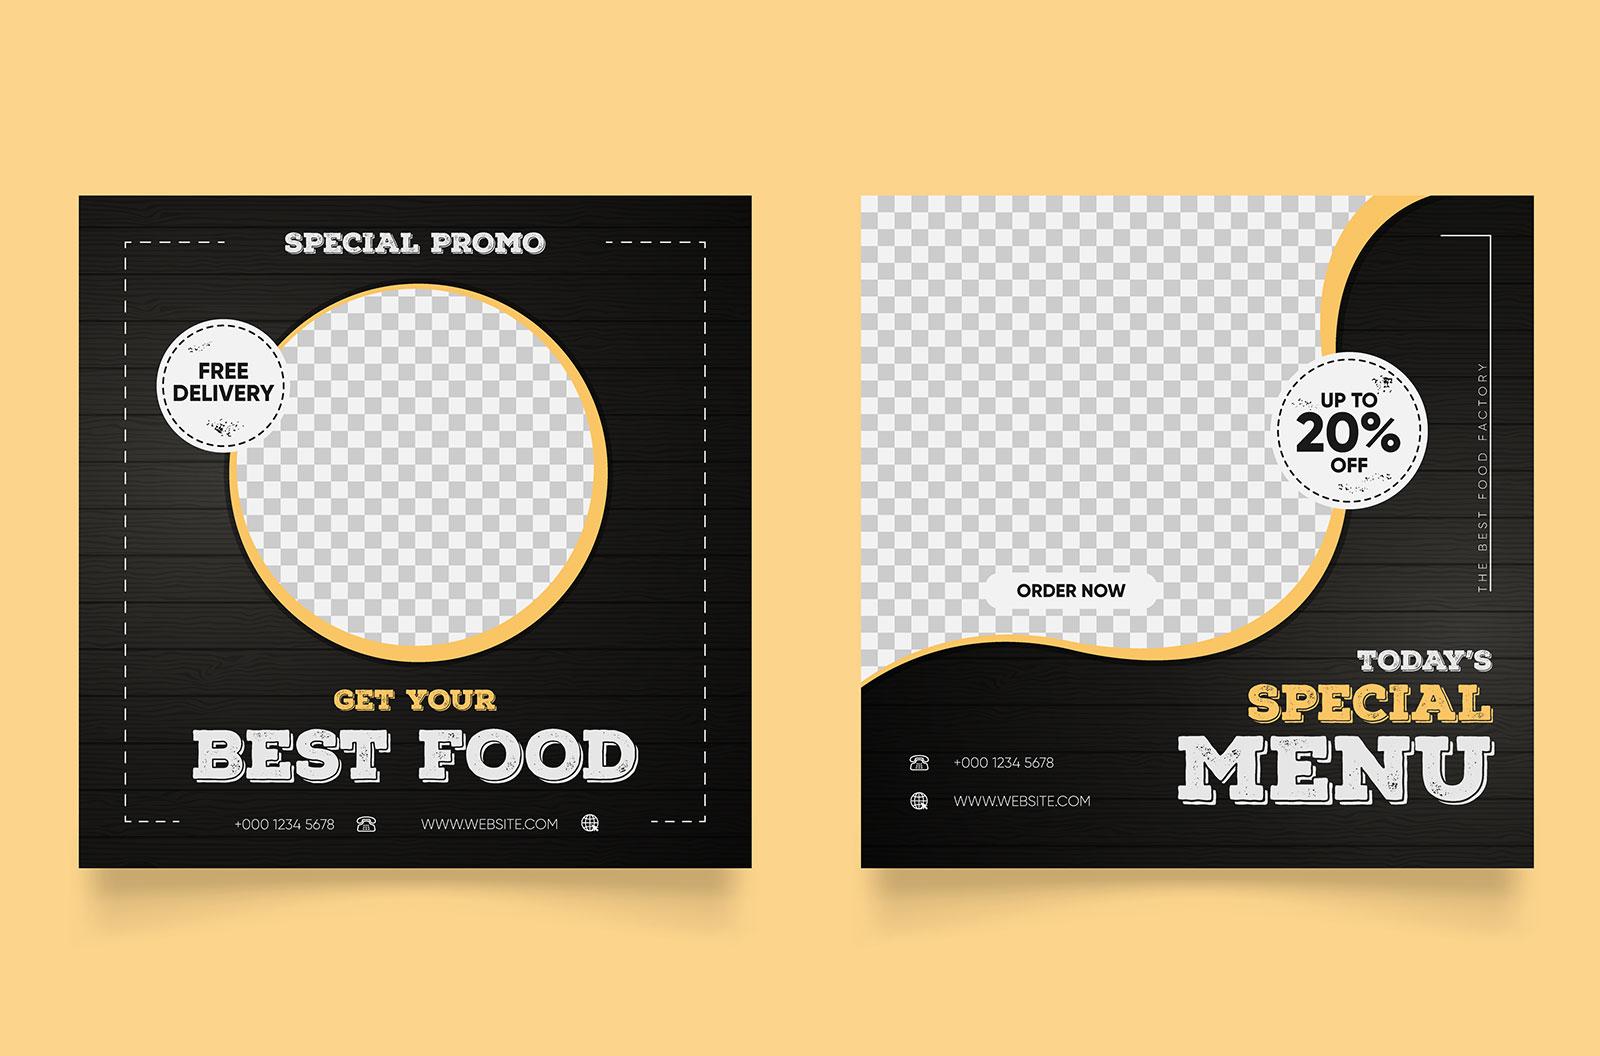 Social media post template for food promotion in simple banner frame stock illustration